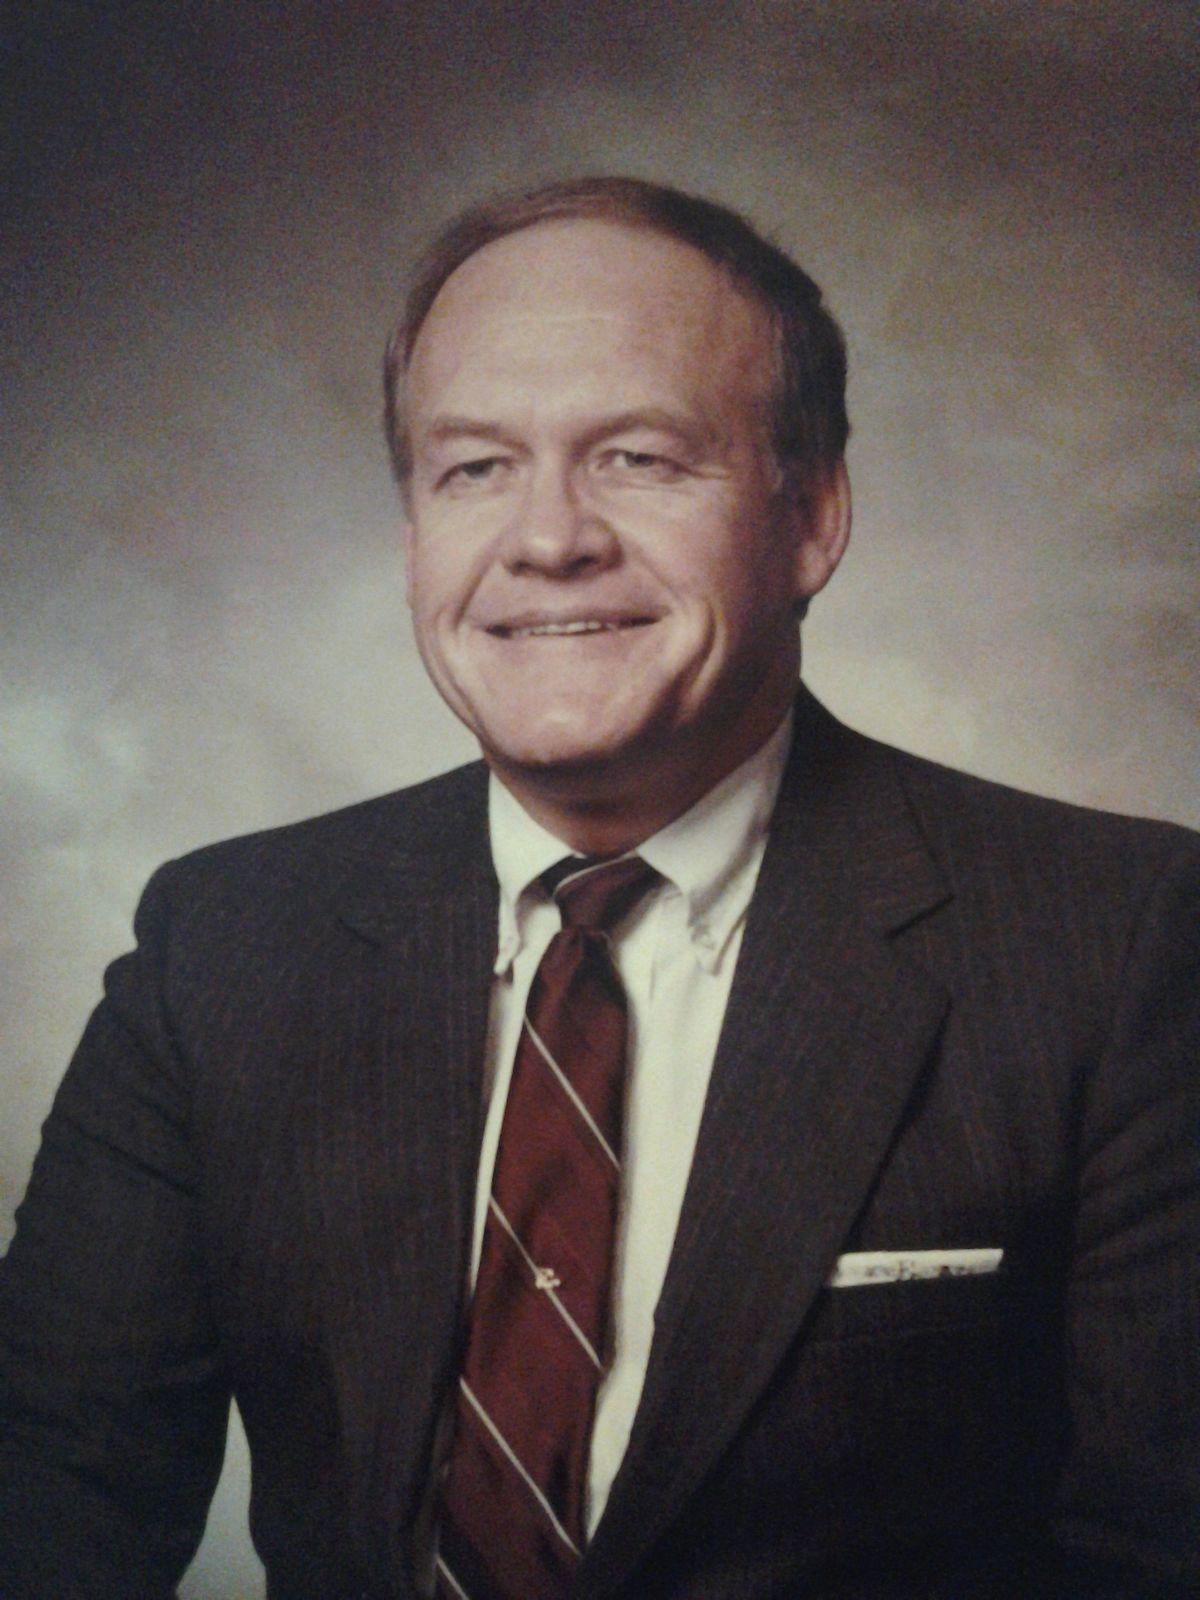 Michael Embley Wikipedia